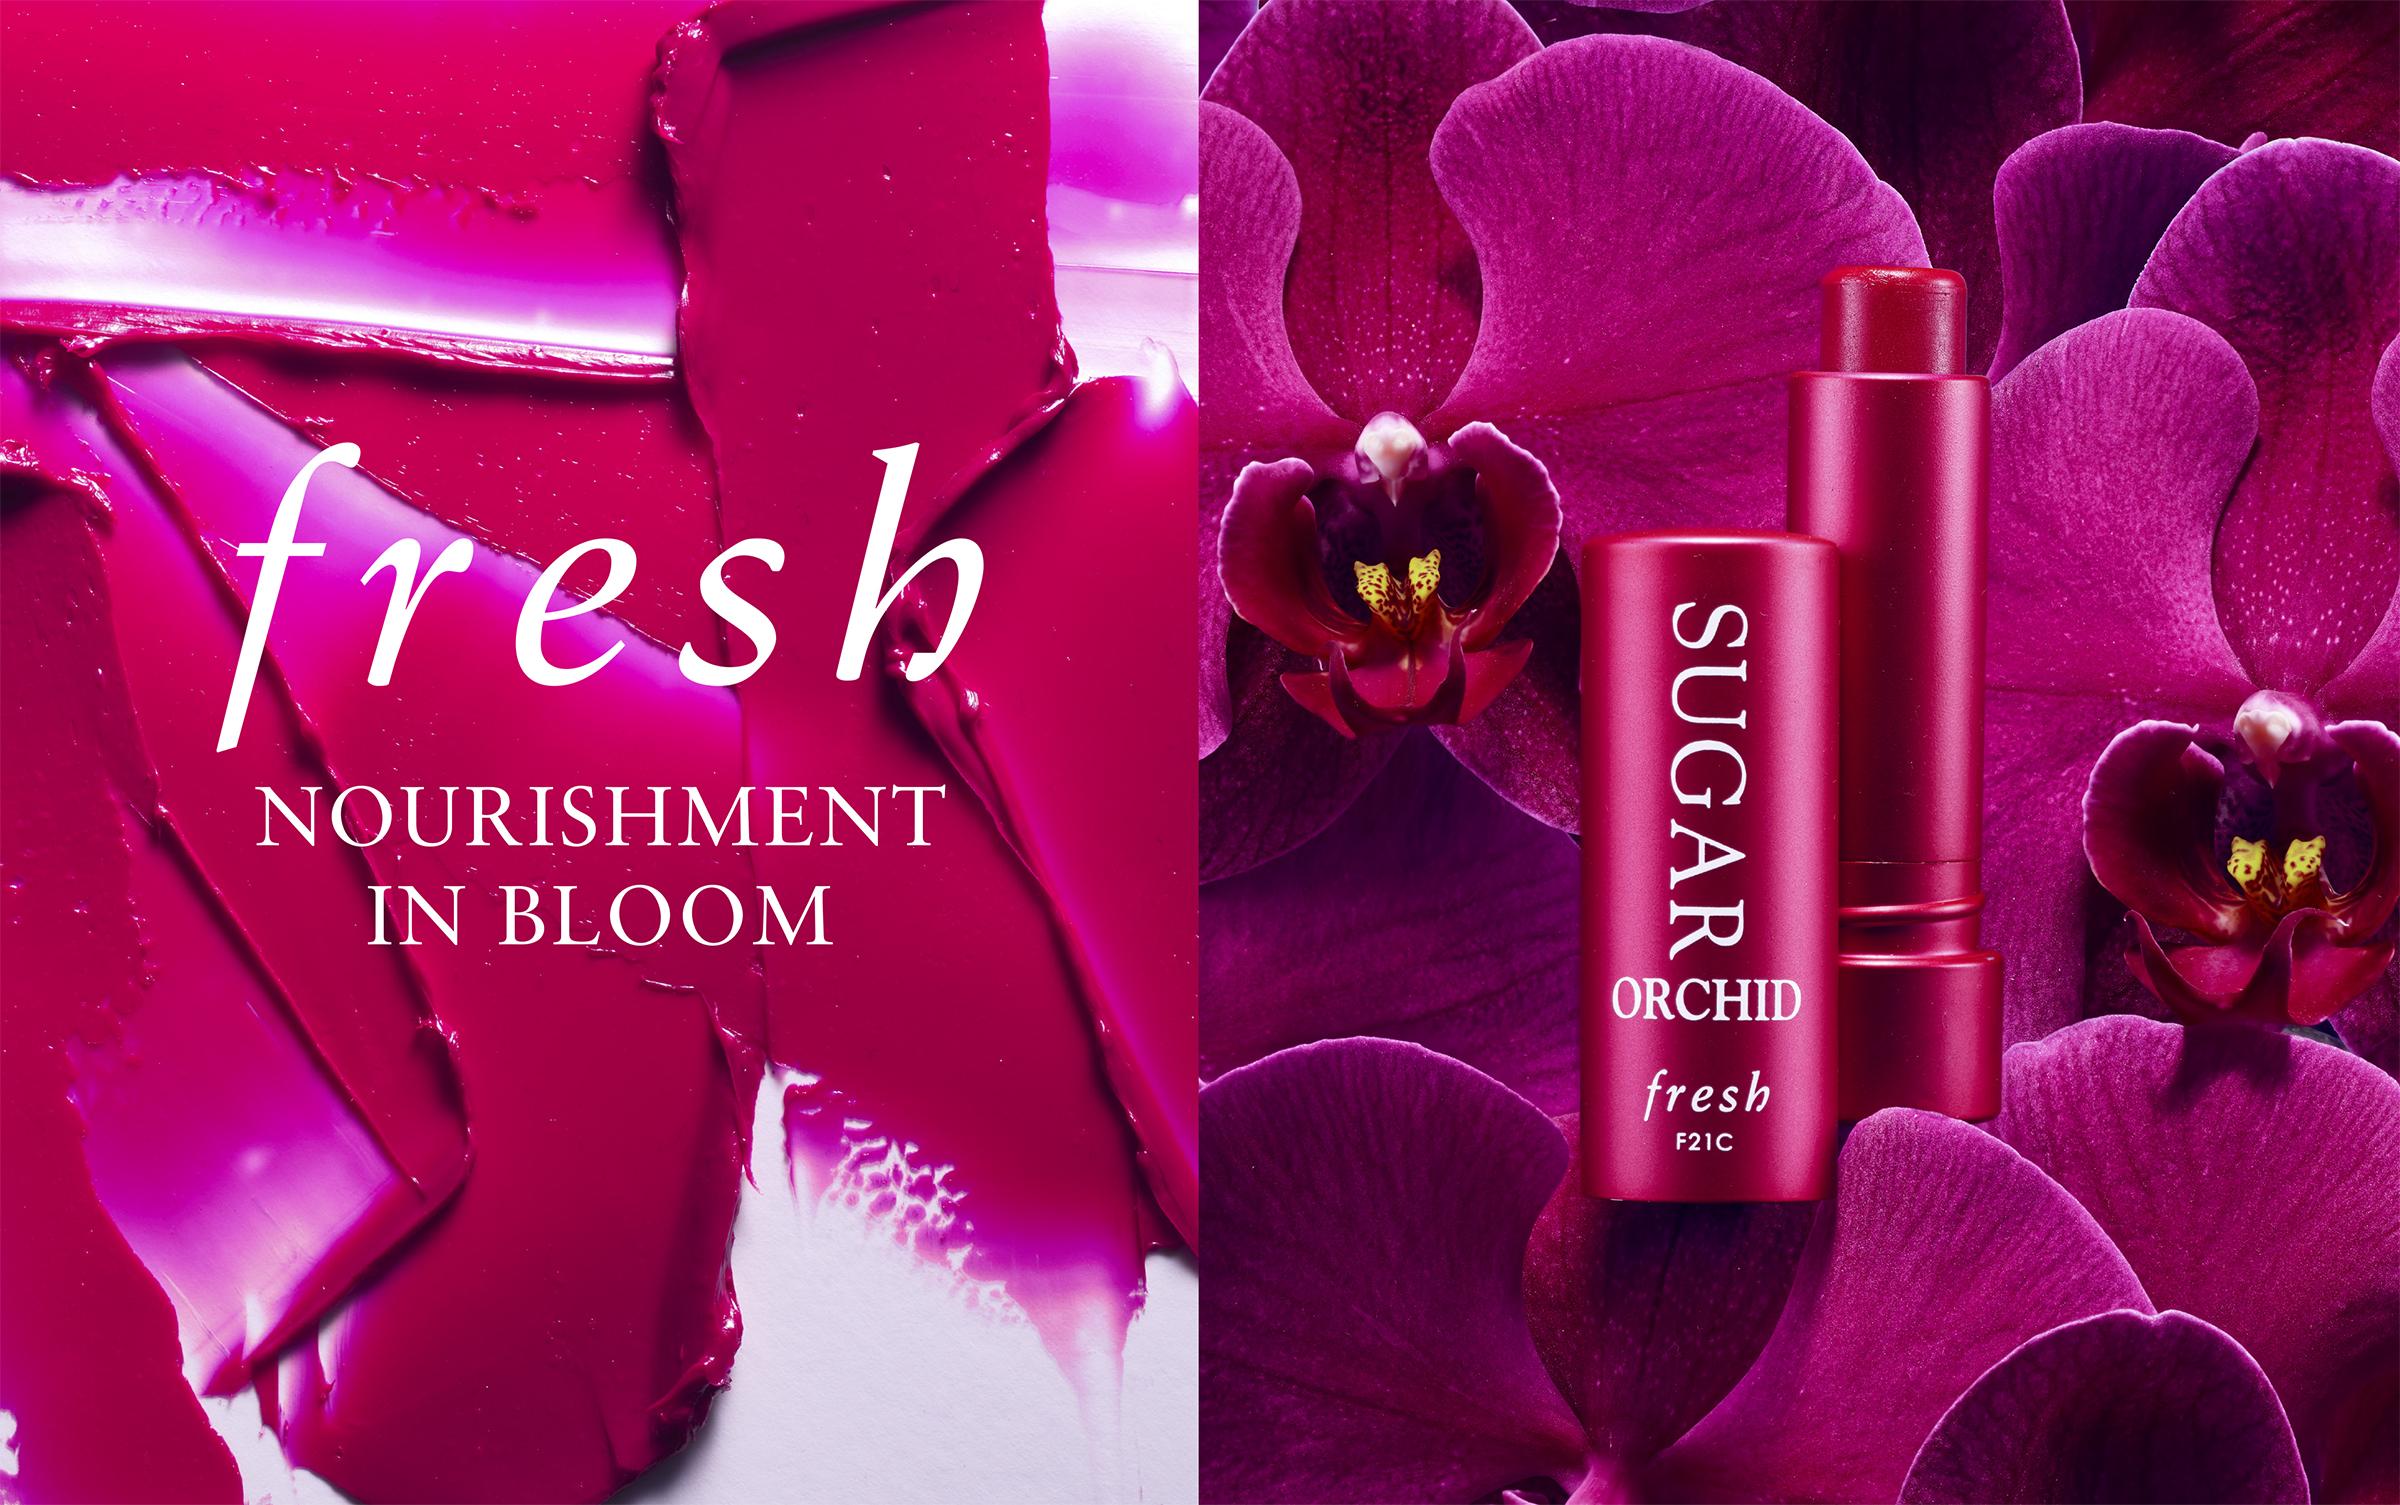 Megan Oiler lipstick packaging design